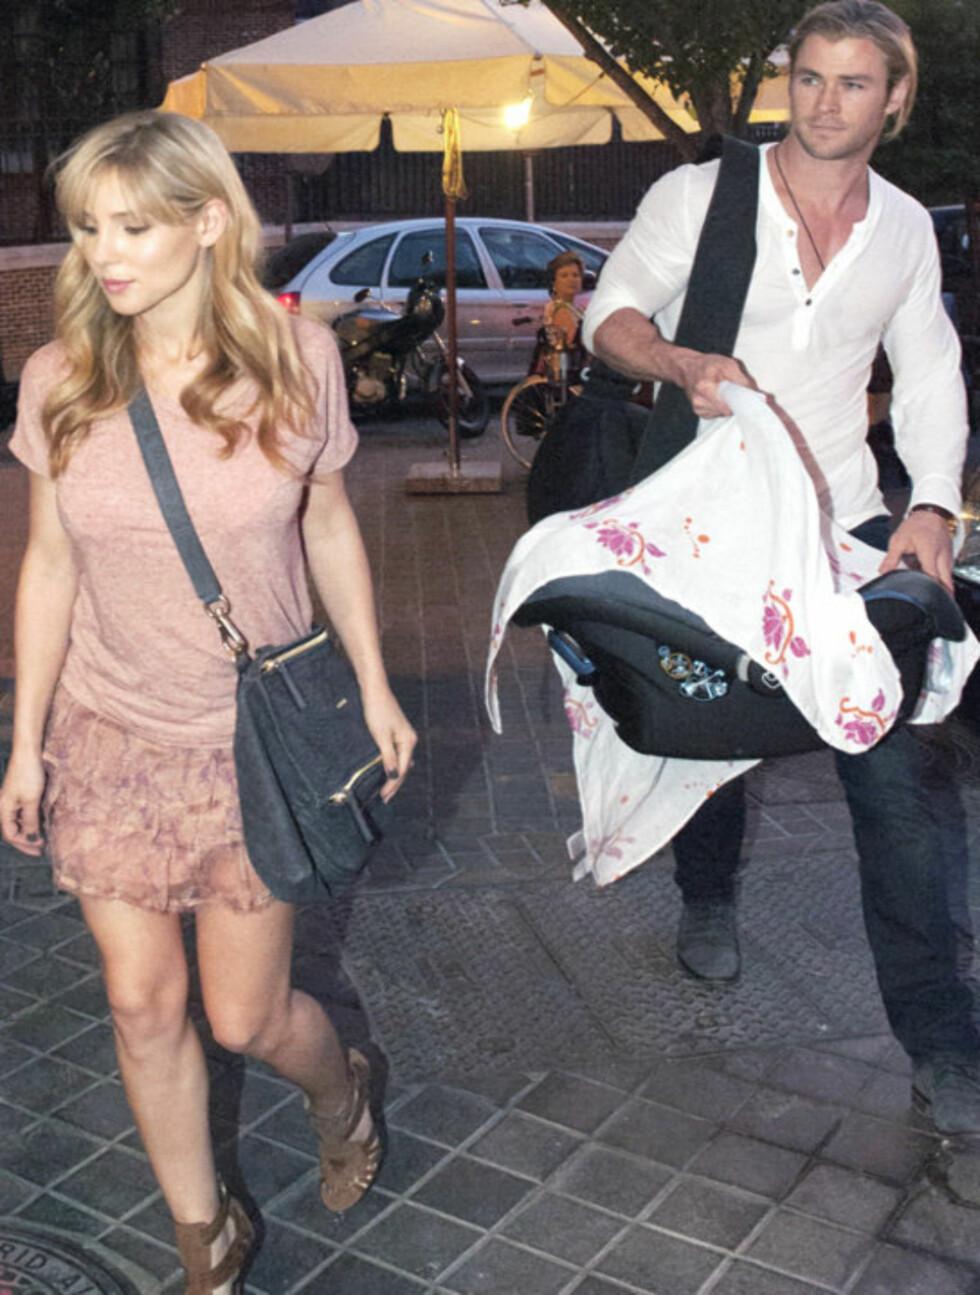 PENT PAR: Skuespillerparet Elsa Pataky og Chris Hemsworth ute på tur med datteren.  Foto: Stella Pictures